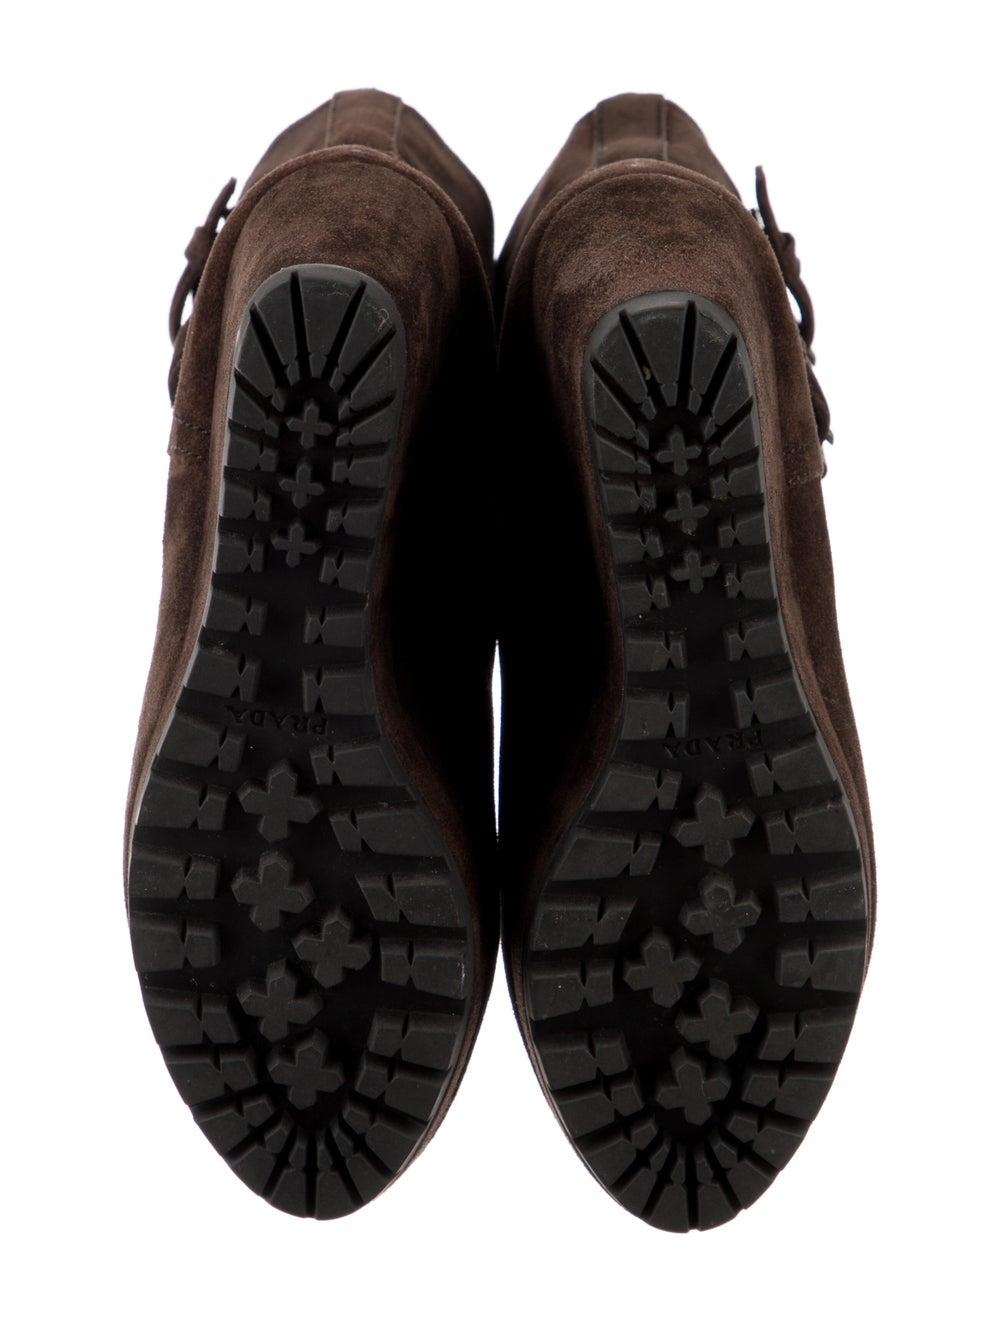 Prada Sport Suede Boots Brown - image 5